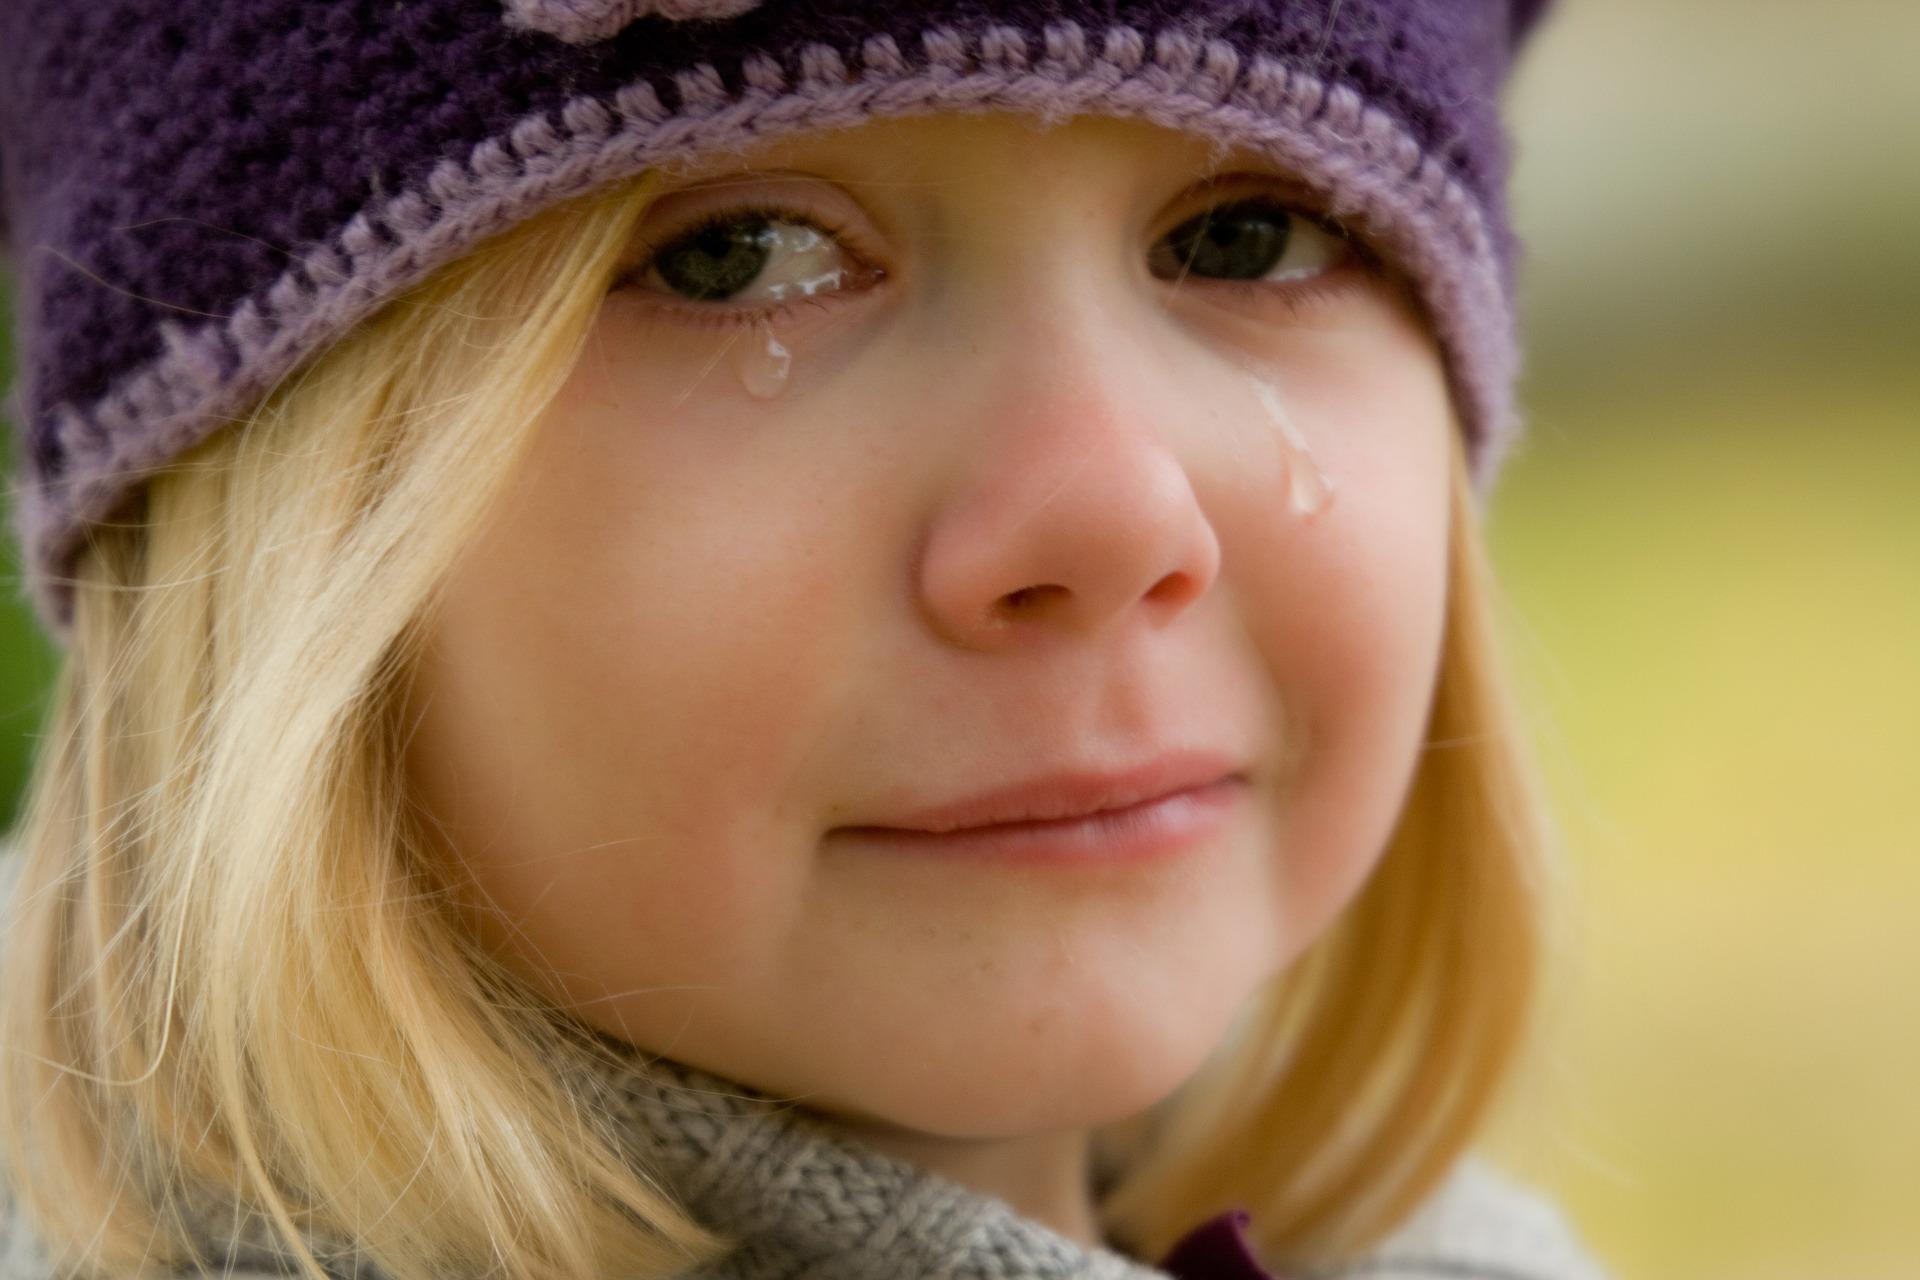 crying-572342_1920.jpg